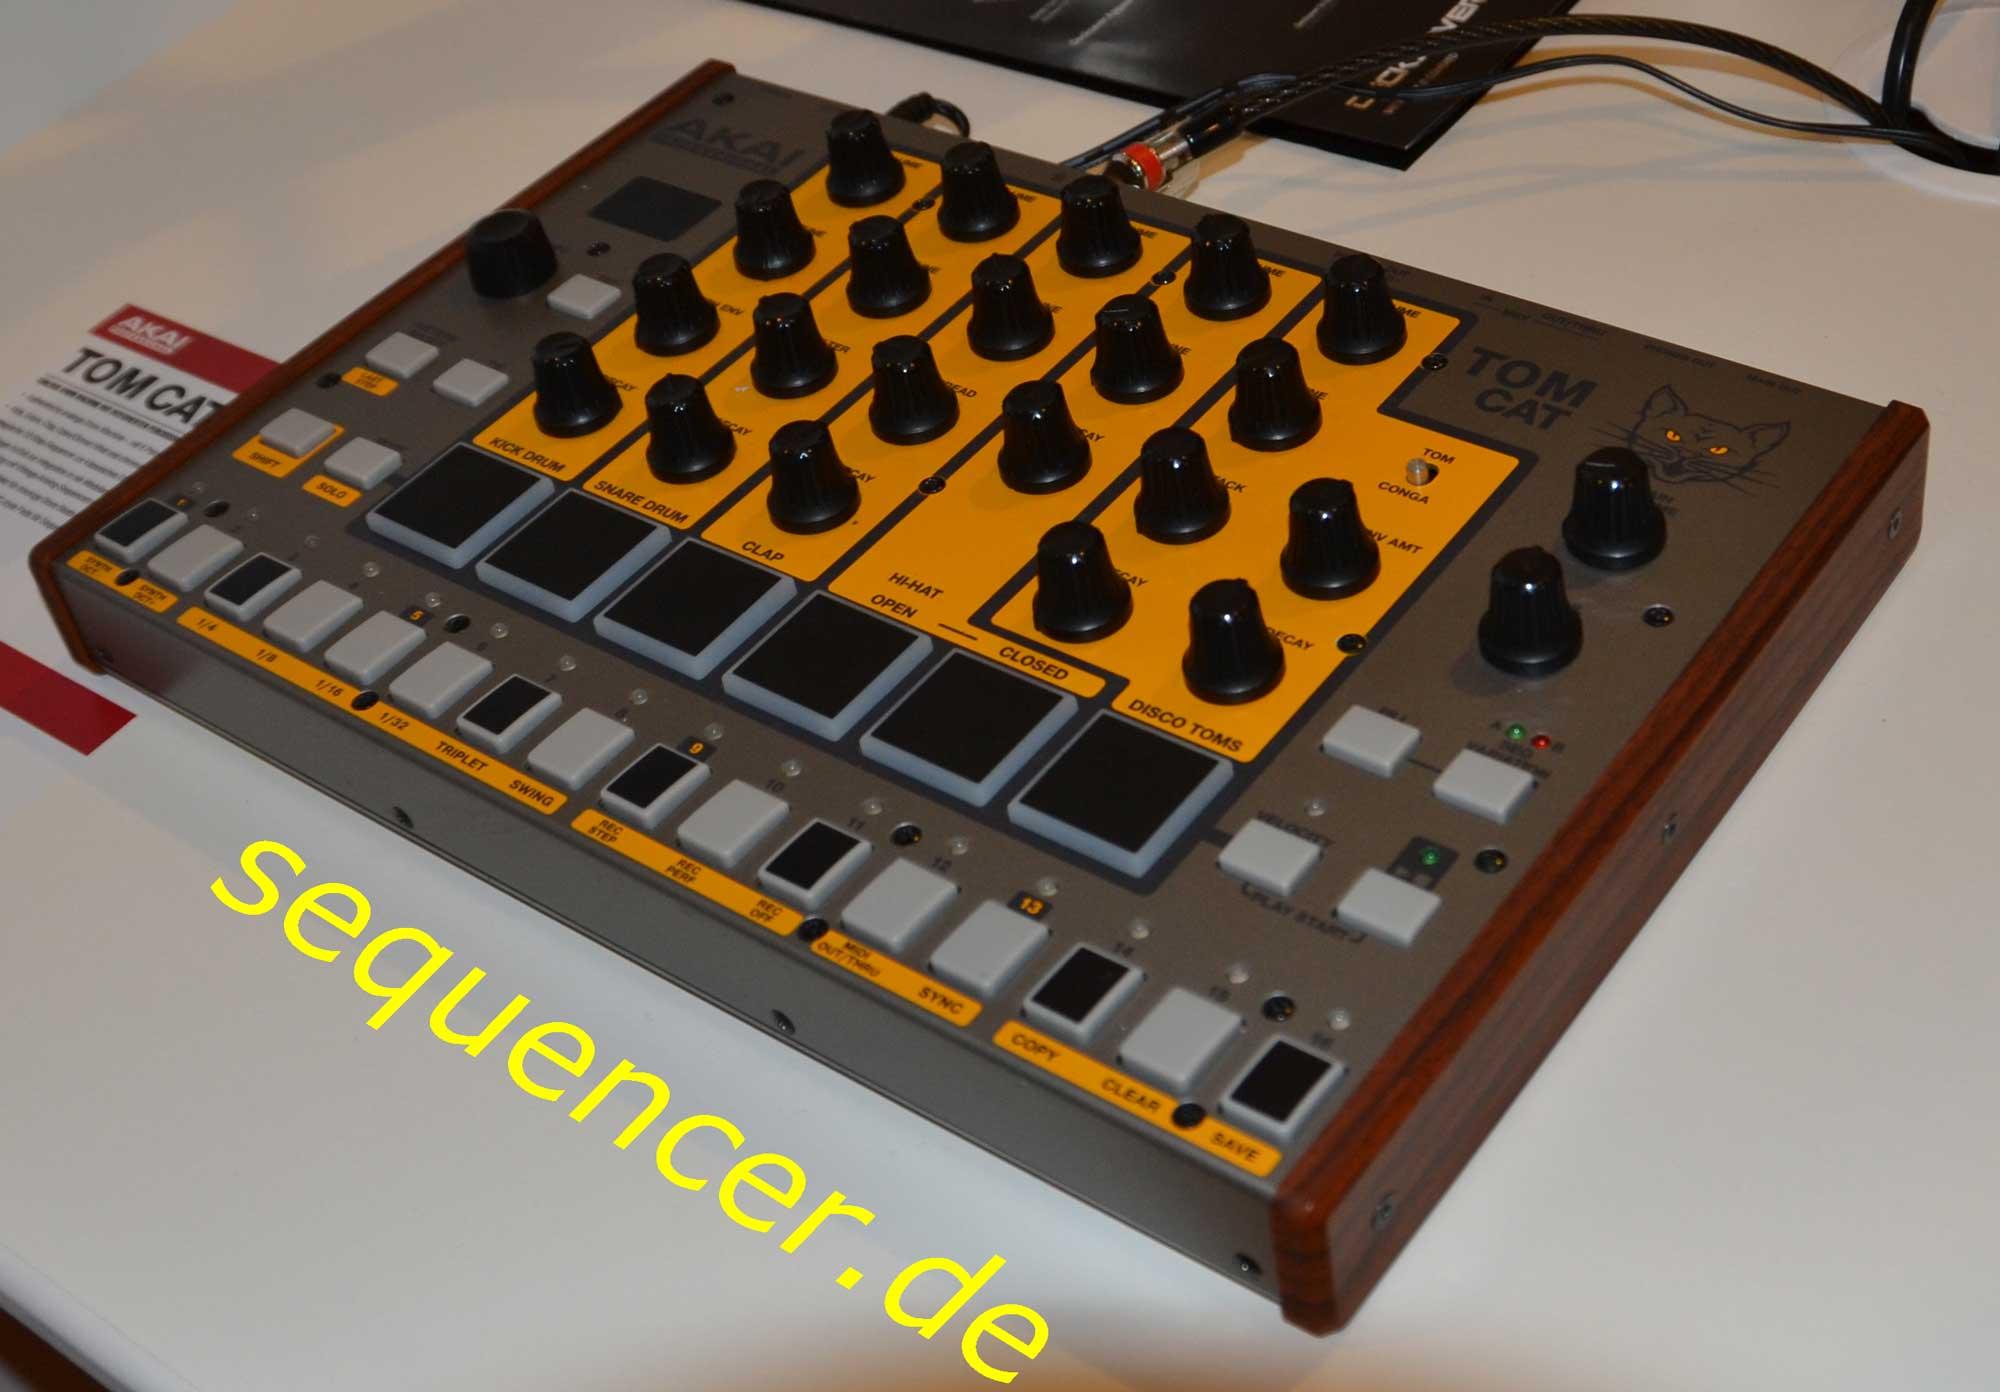 Akai Tomcat synthesizer